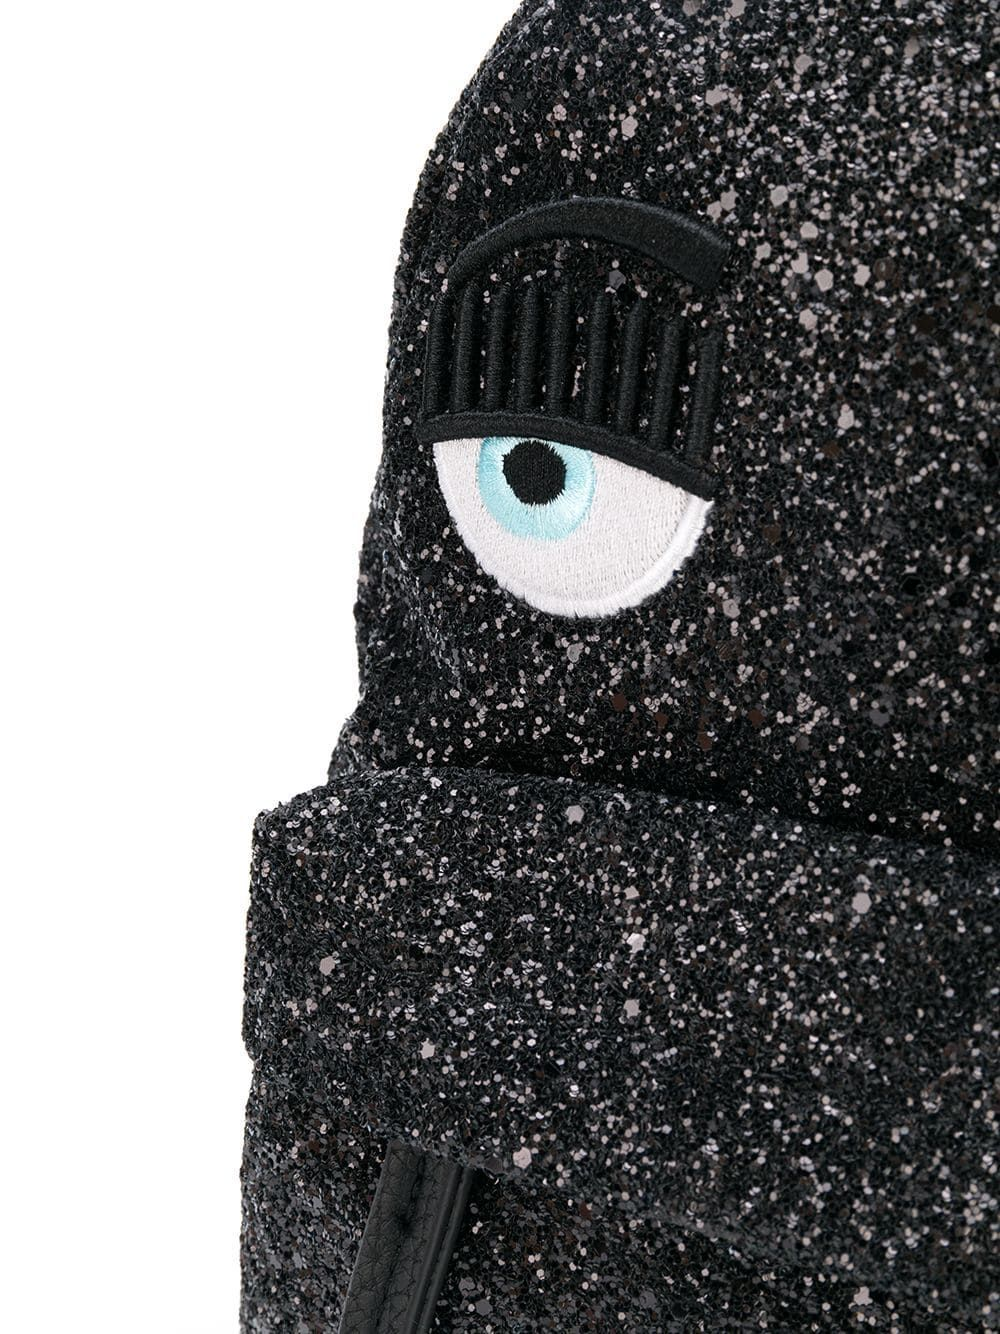 CHIARA FERRAGNI WOMEN'S CFZ004BLACK BLACK POLYESTER BACKPACK